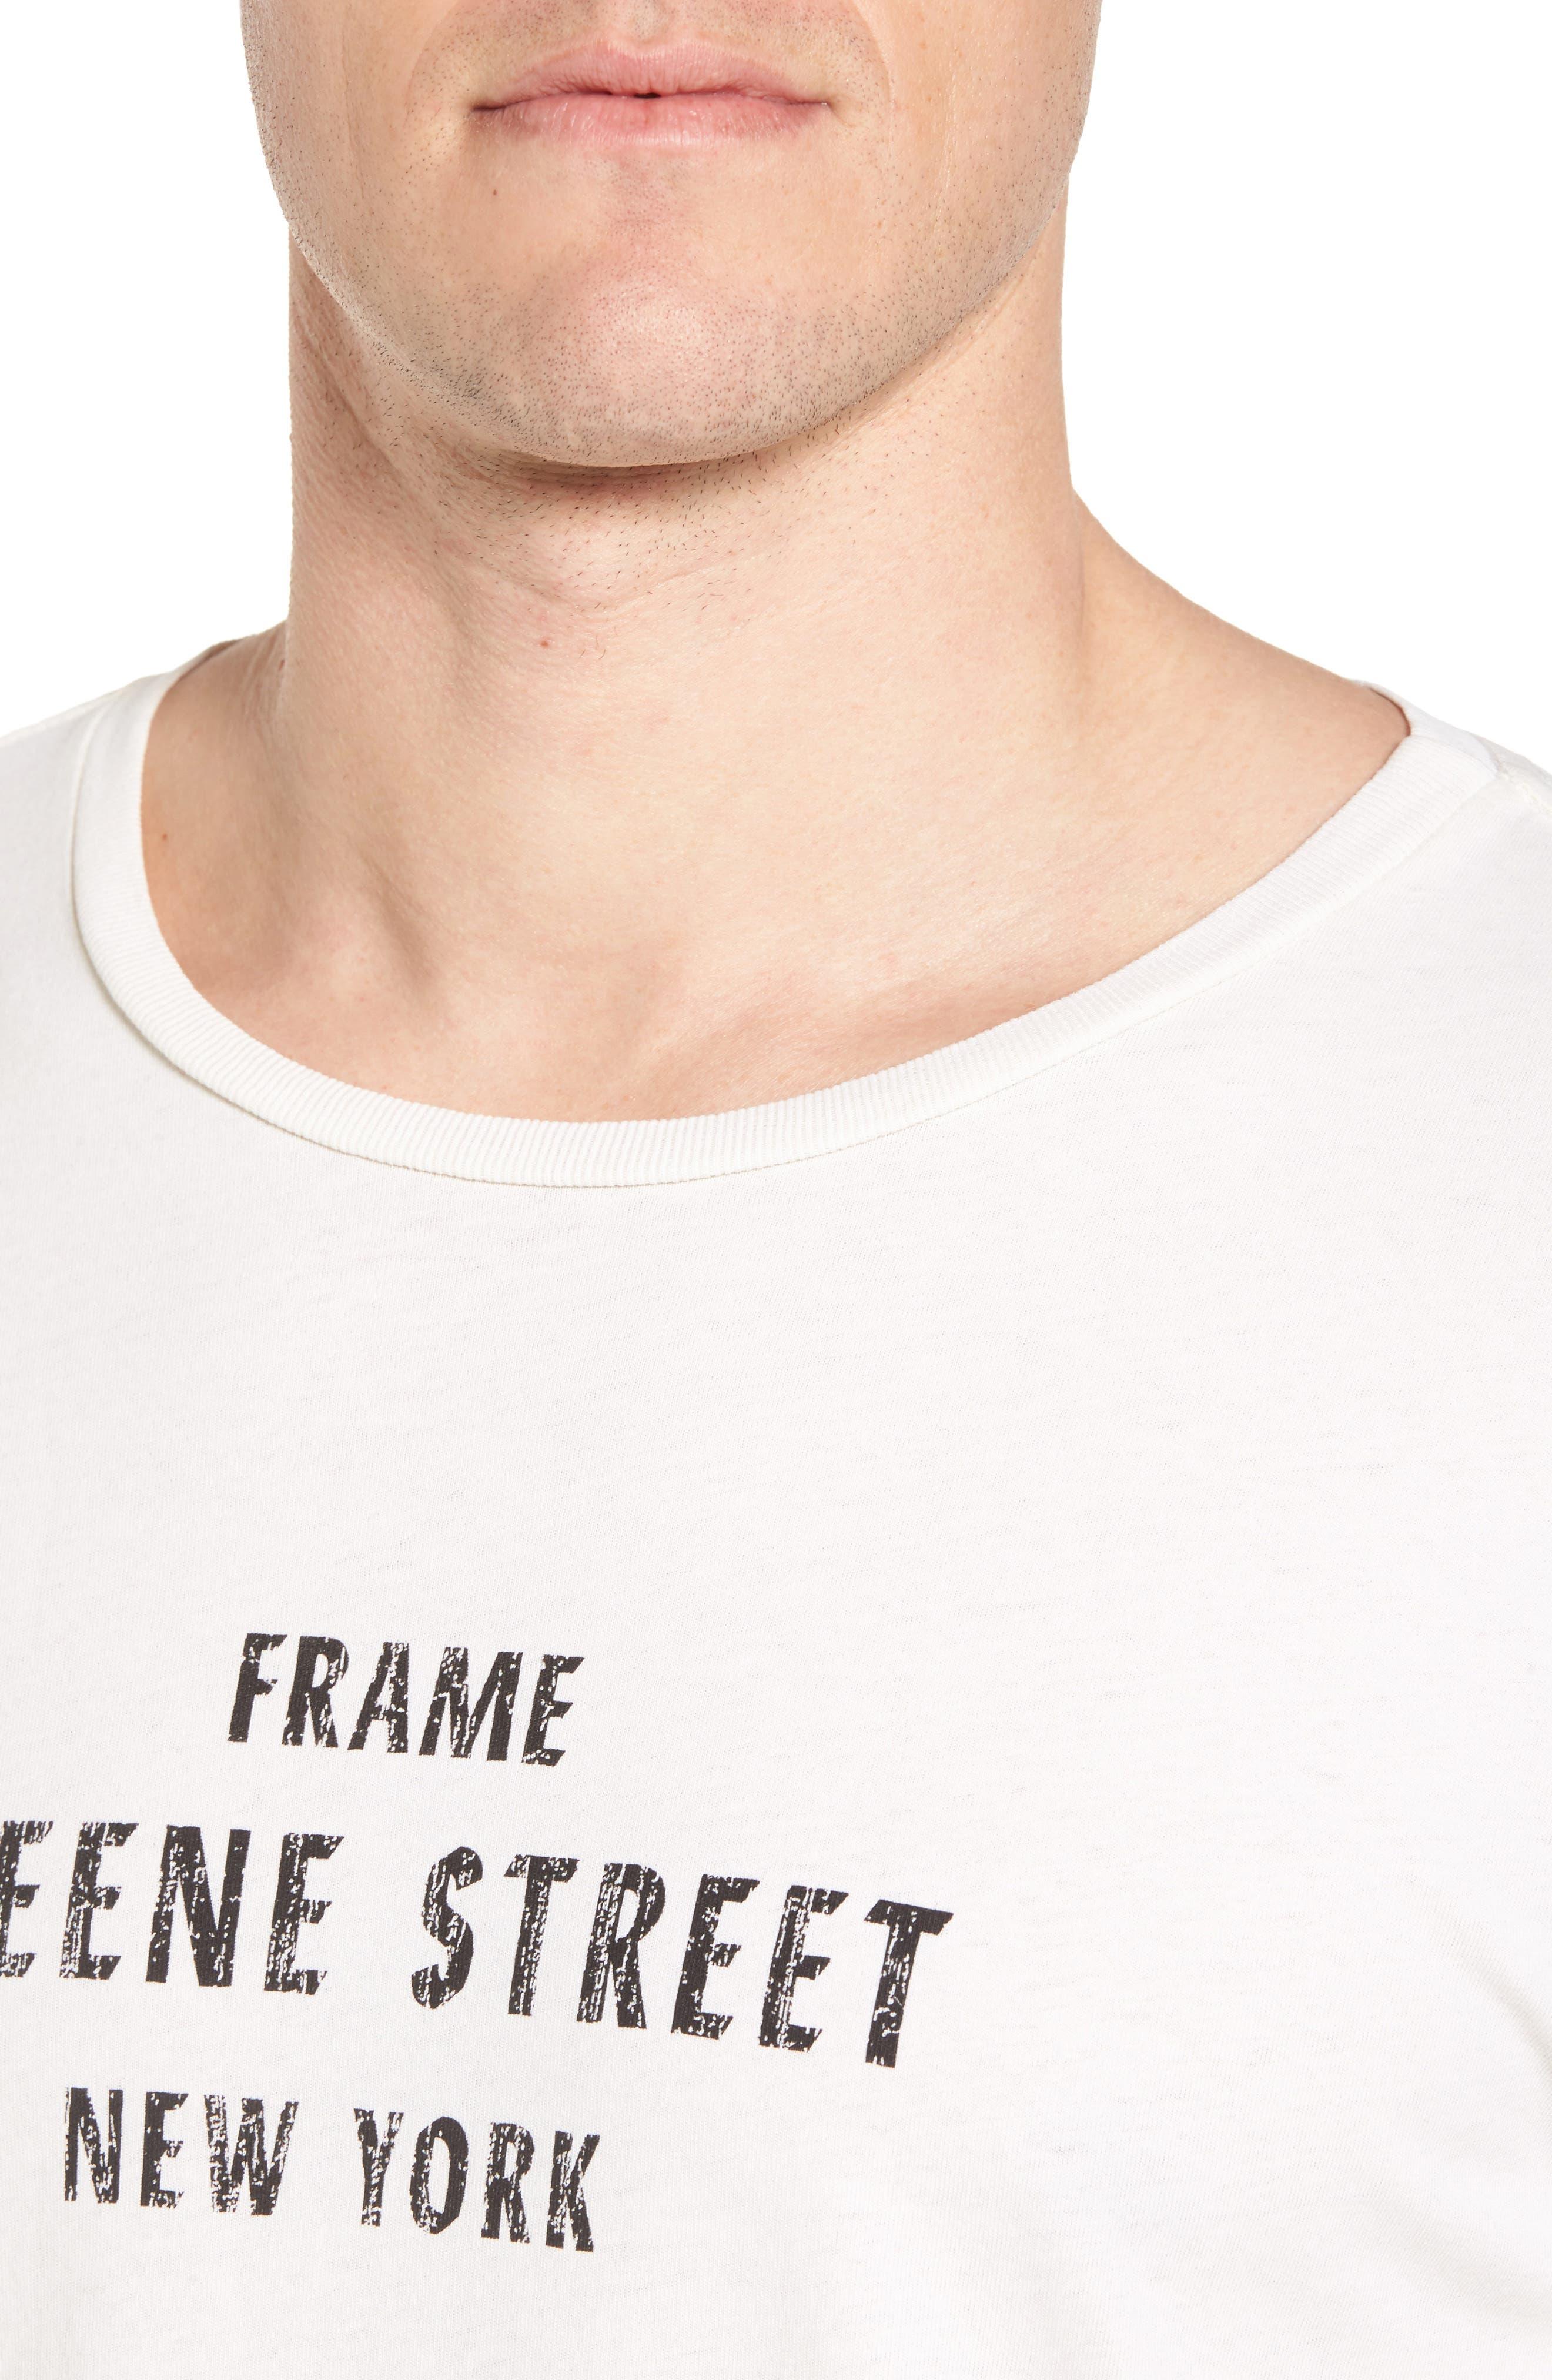 Greene Street Vintage Graphic T-Shirt,                             Alternate thumbnail 4, color,                             Off White